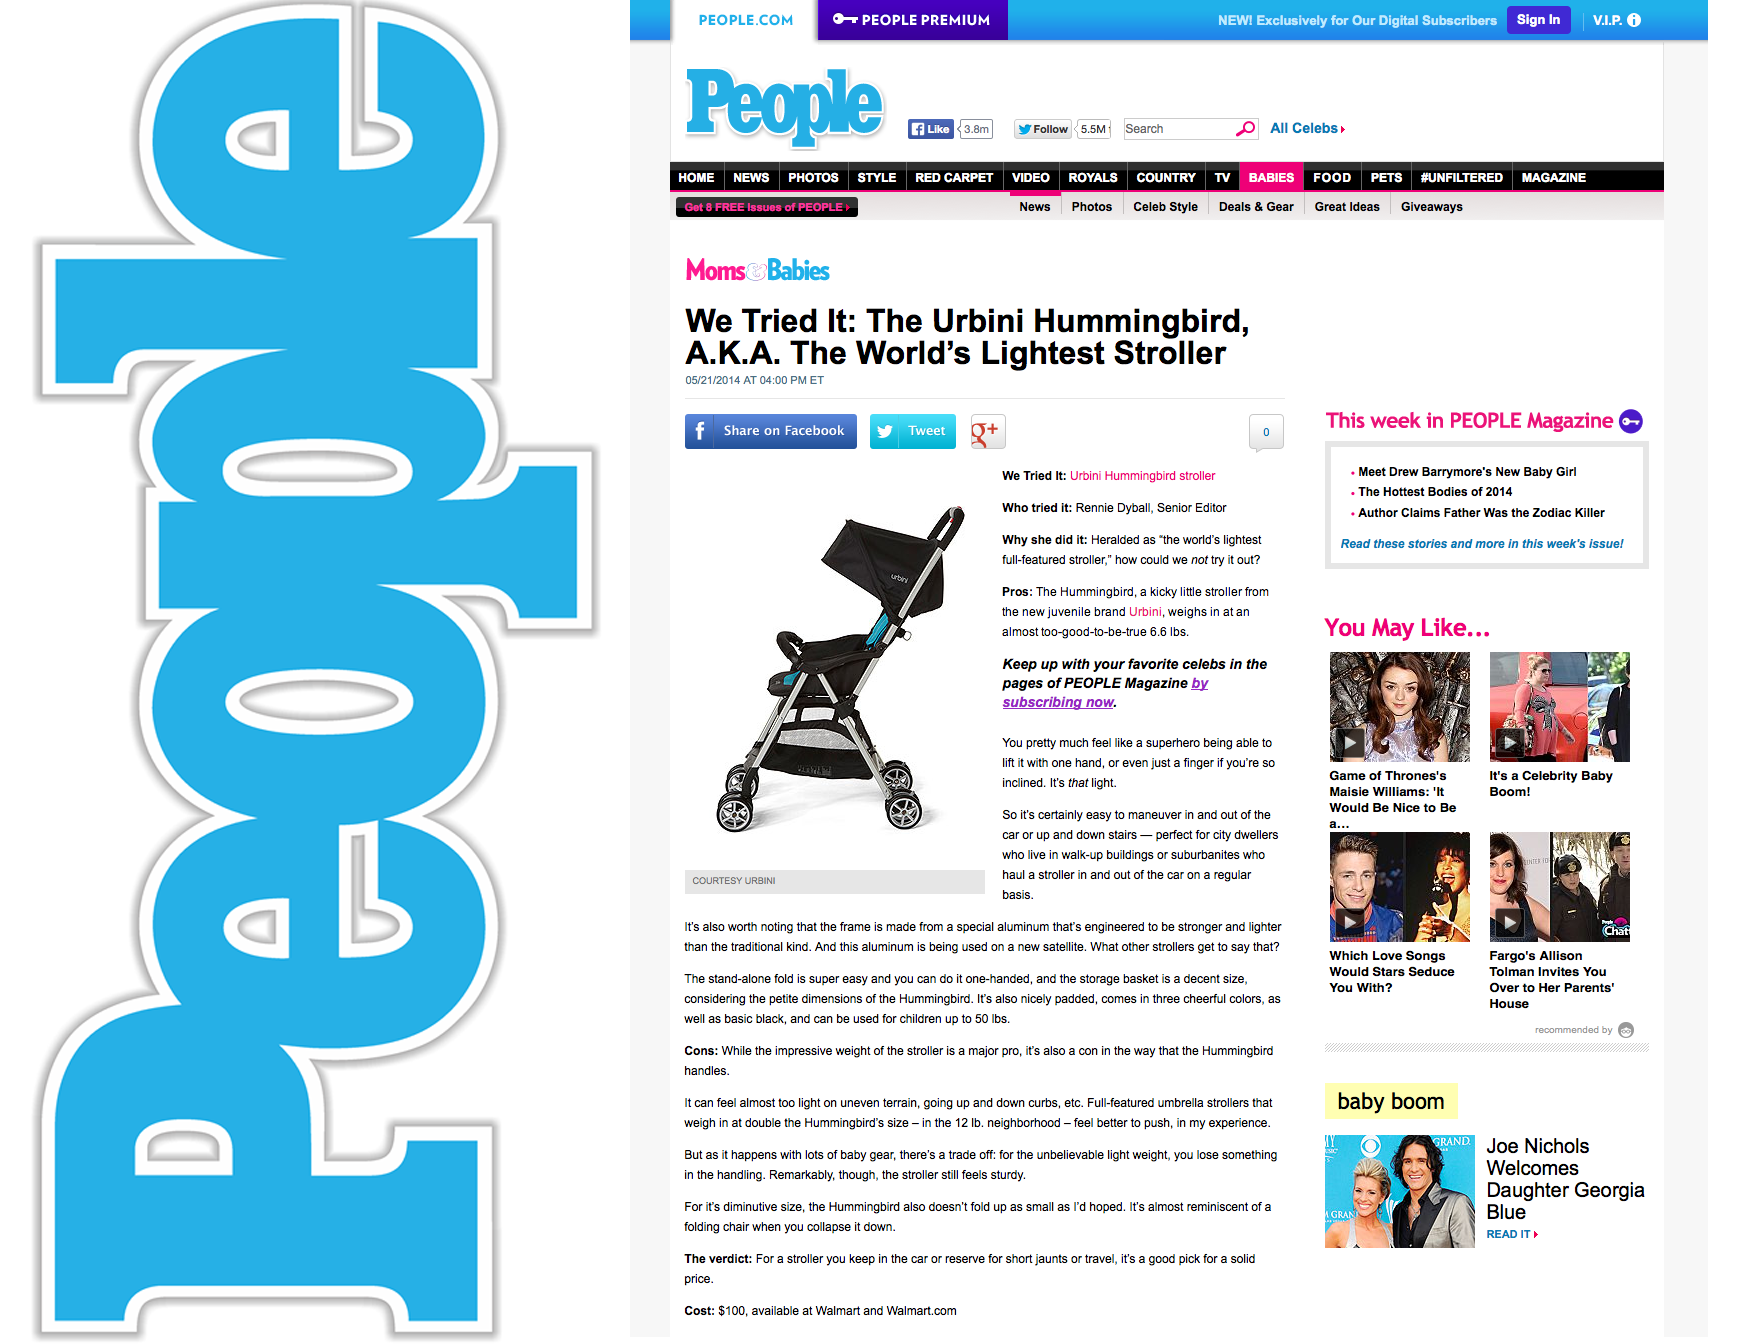 (People) Moms & Babies - Celebrity Baby Blog_Urbini Hummingbird